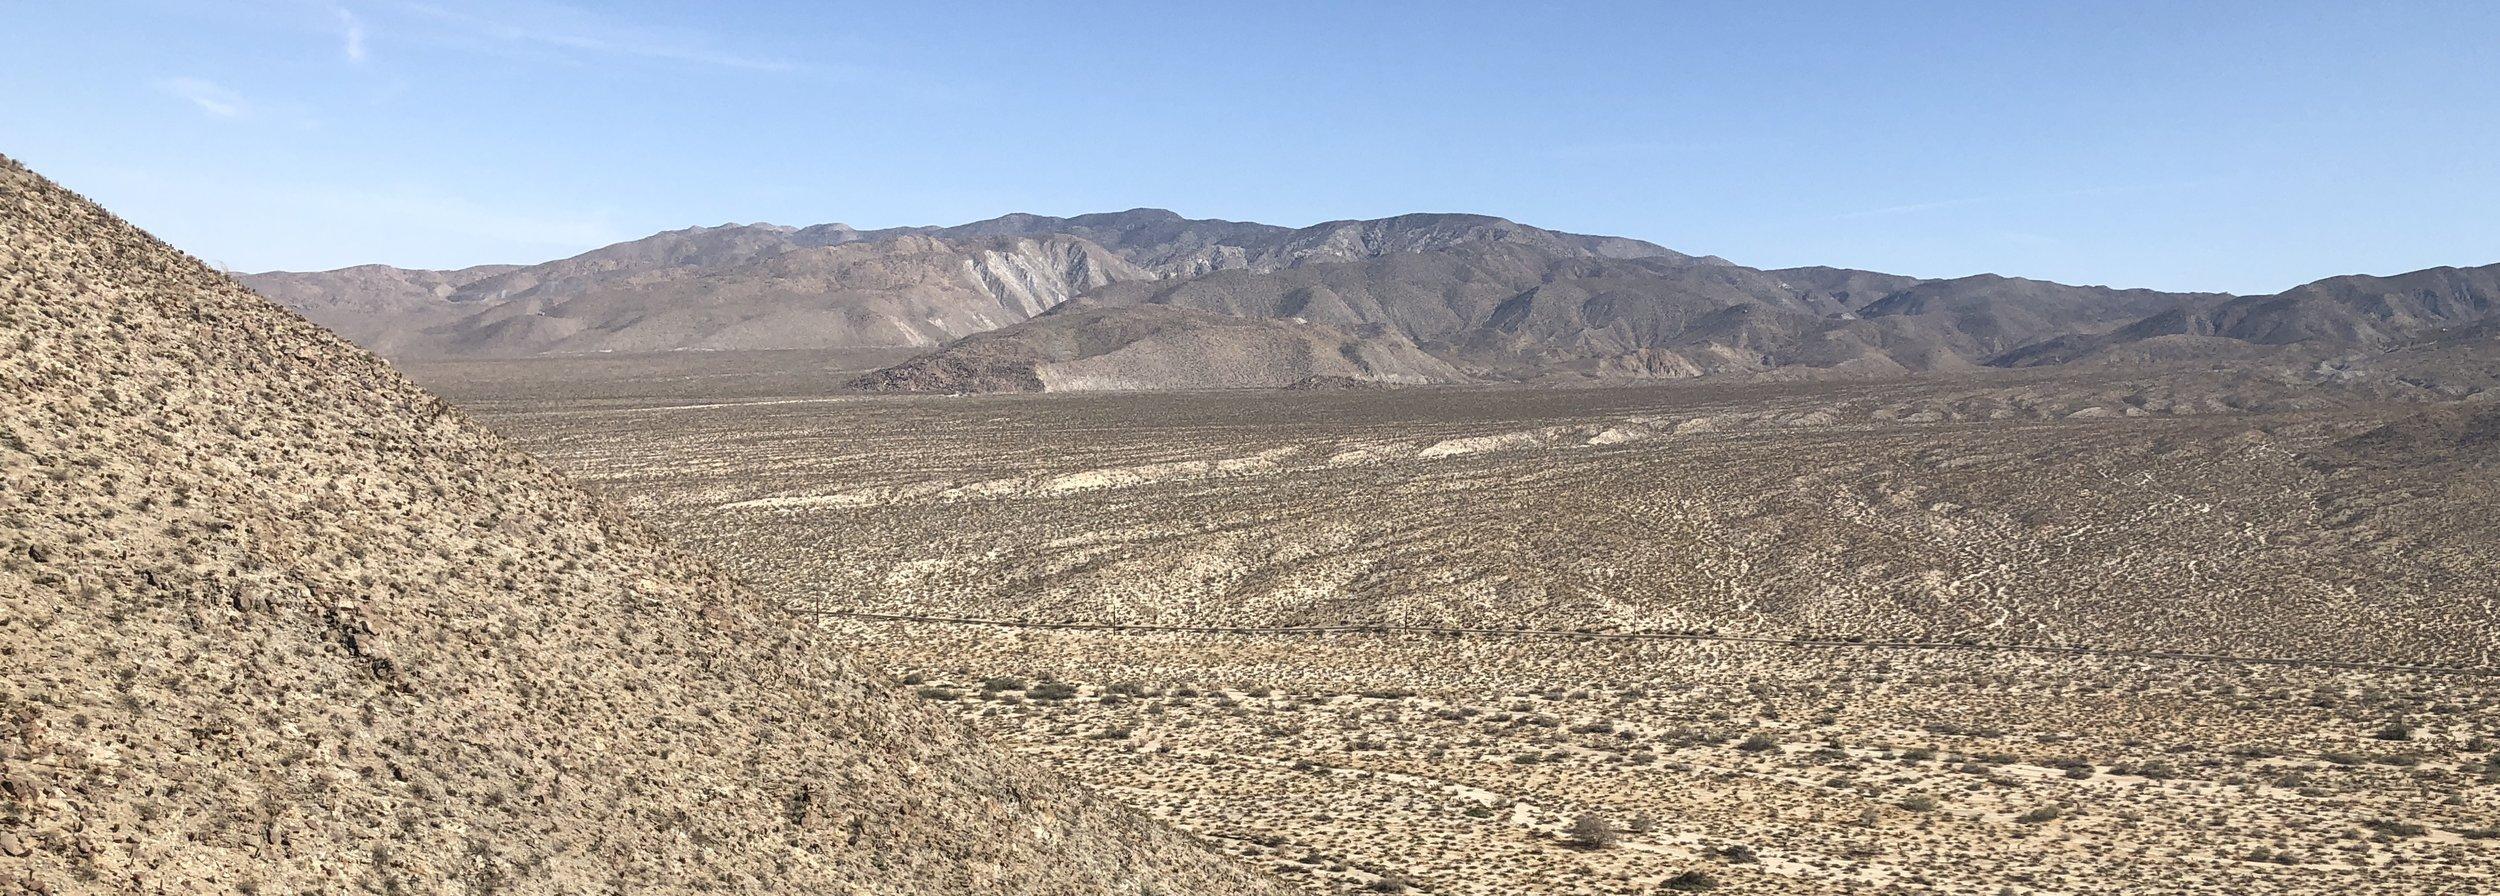 Hot Stuff! Anza-Borrego Desert, east of San Diego.